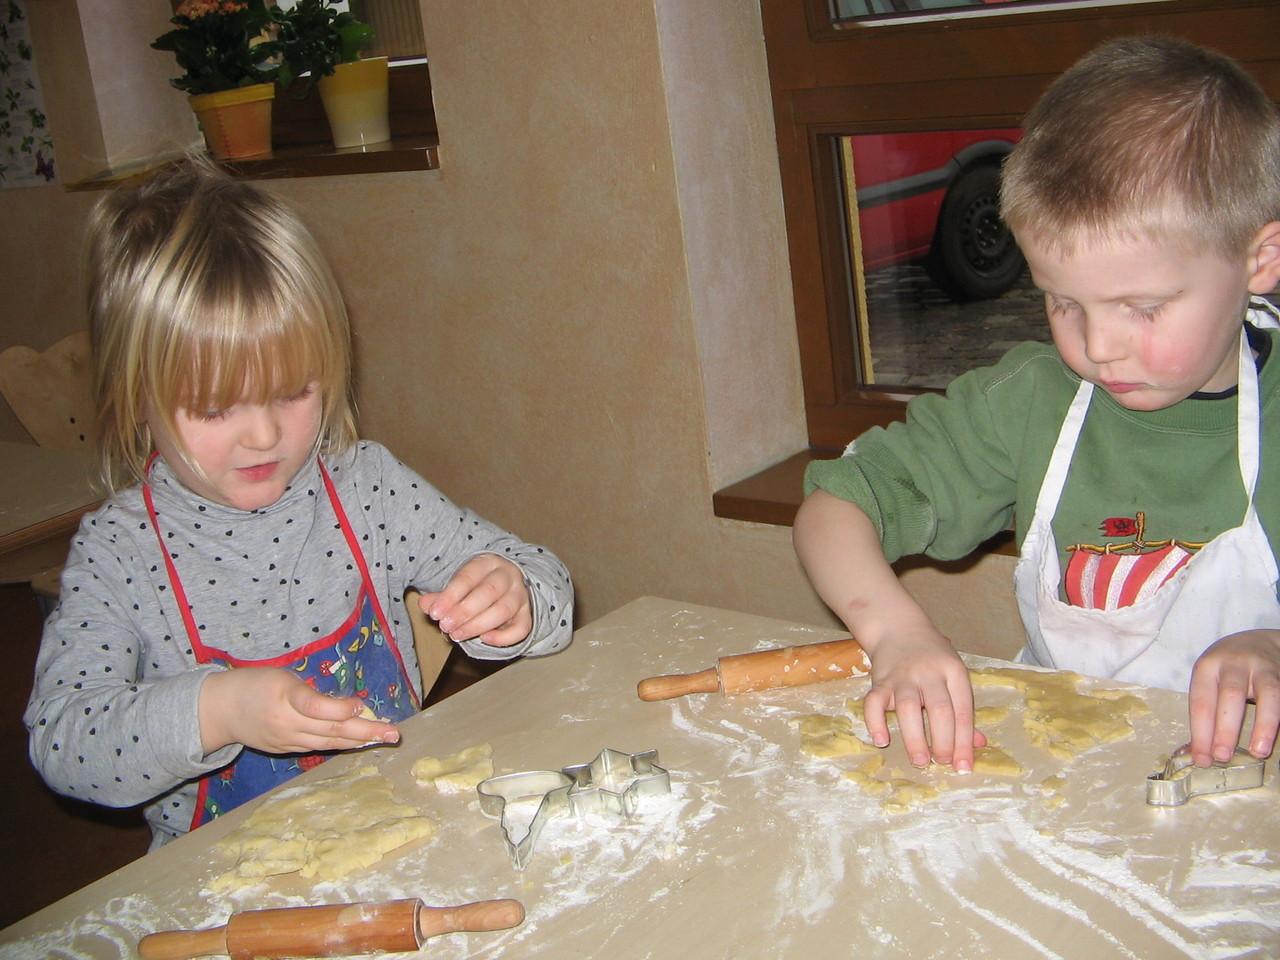 Wir backen ganz oft Plätzchen, Kuchen oder sogar echte Muffins.